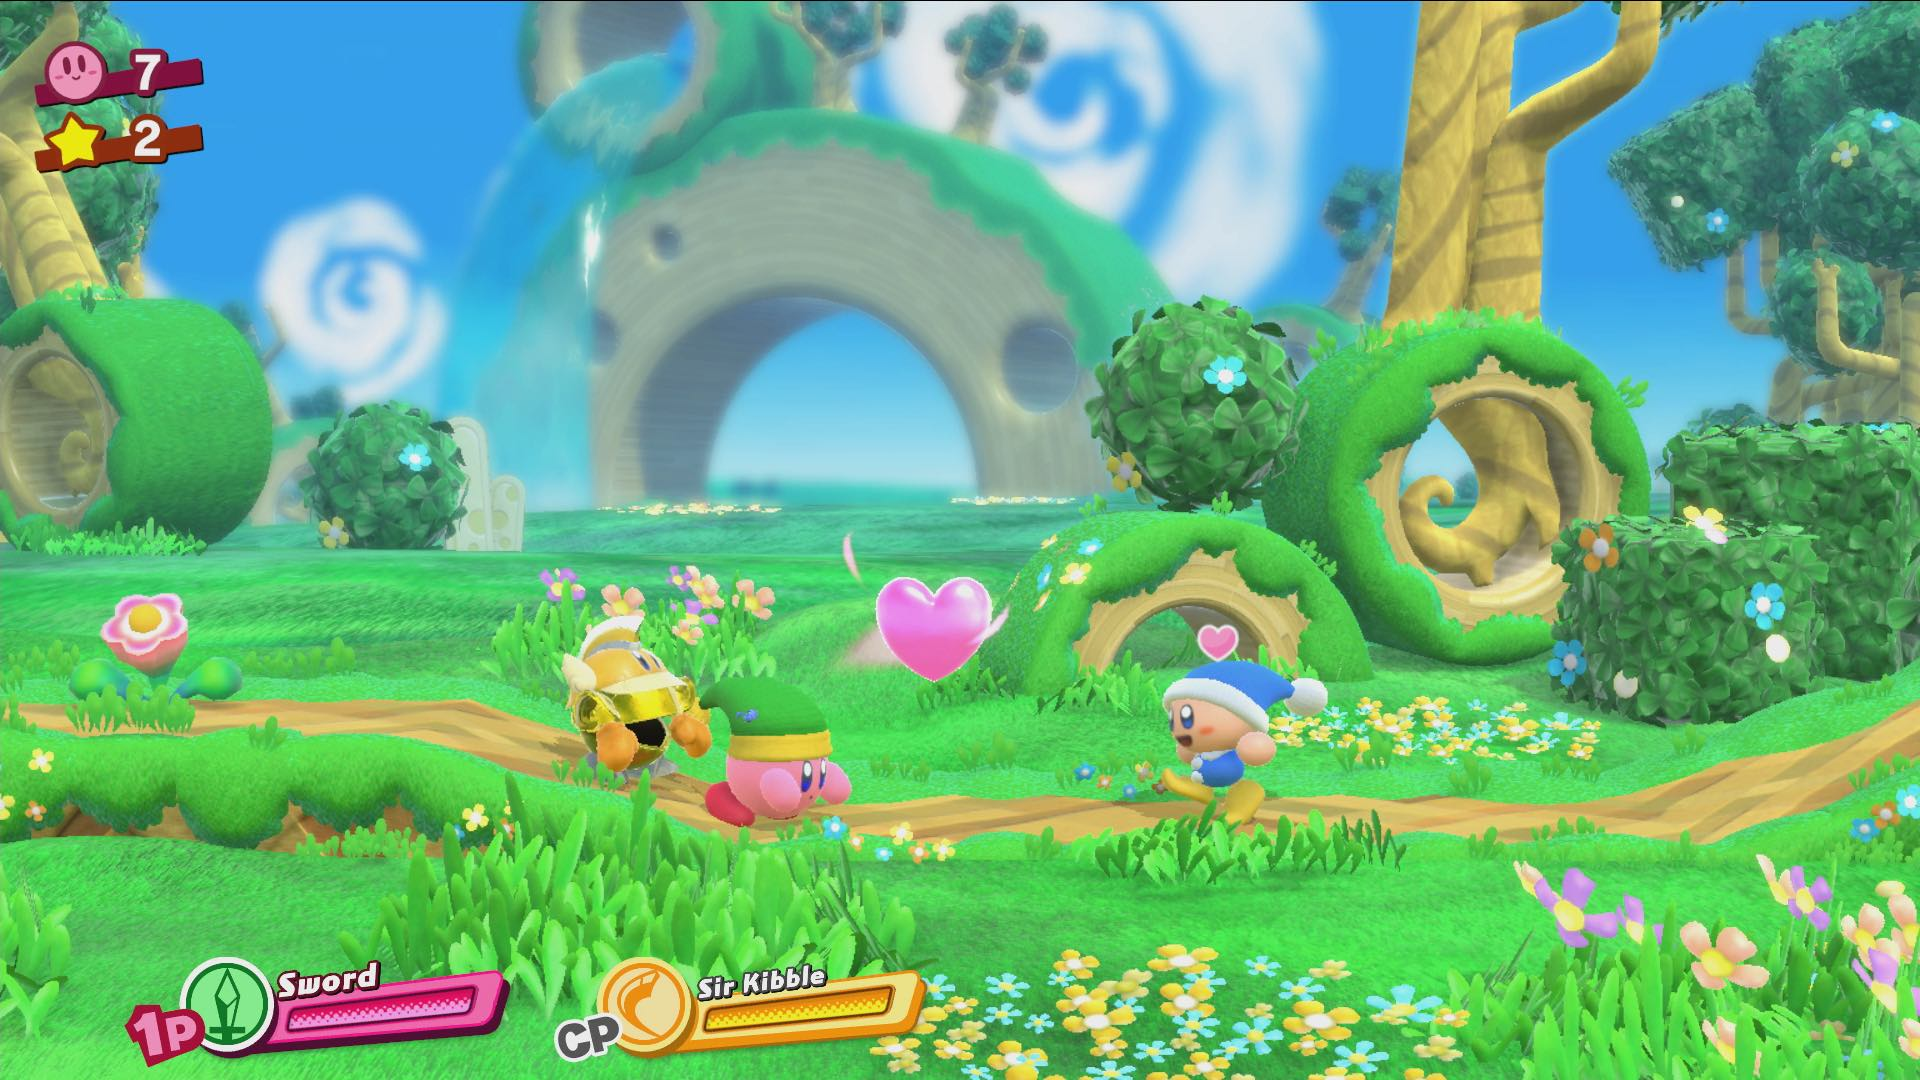 Switch_Kirby_E3-2017-SCRN_042